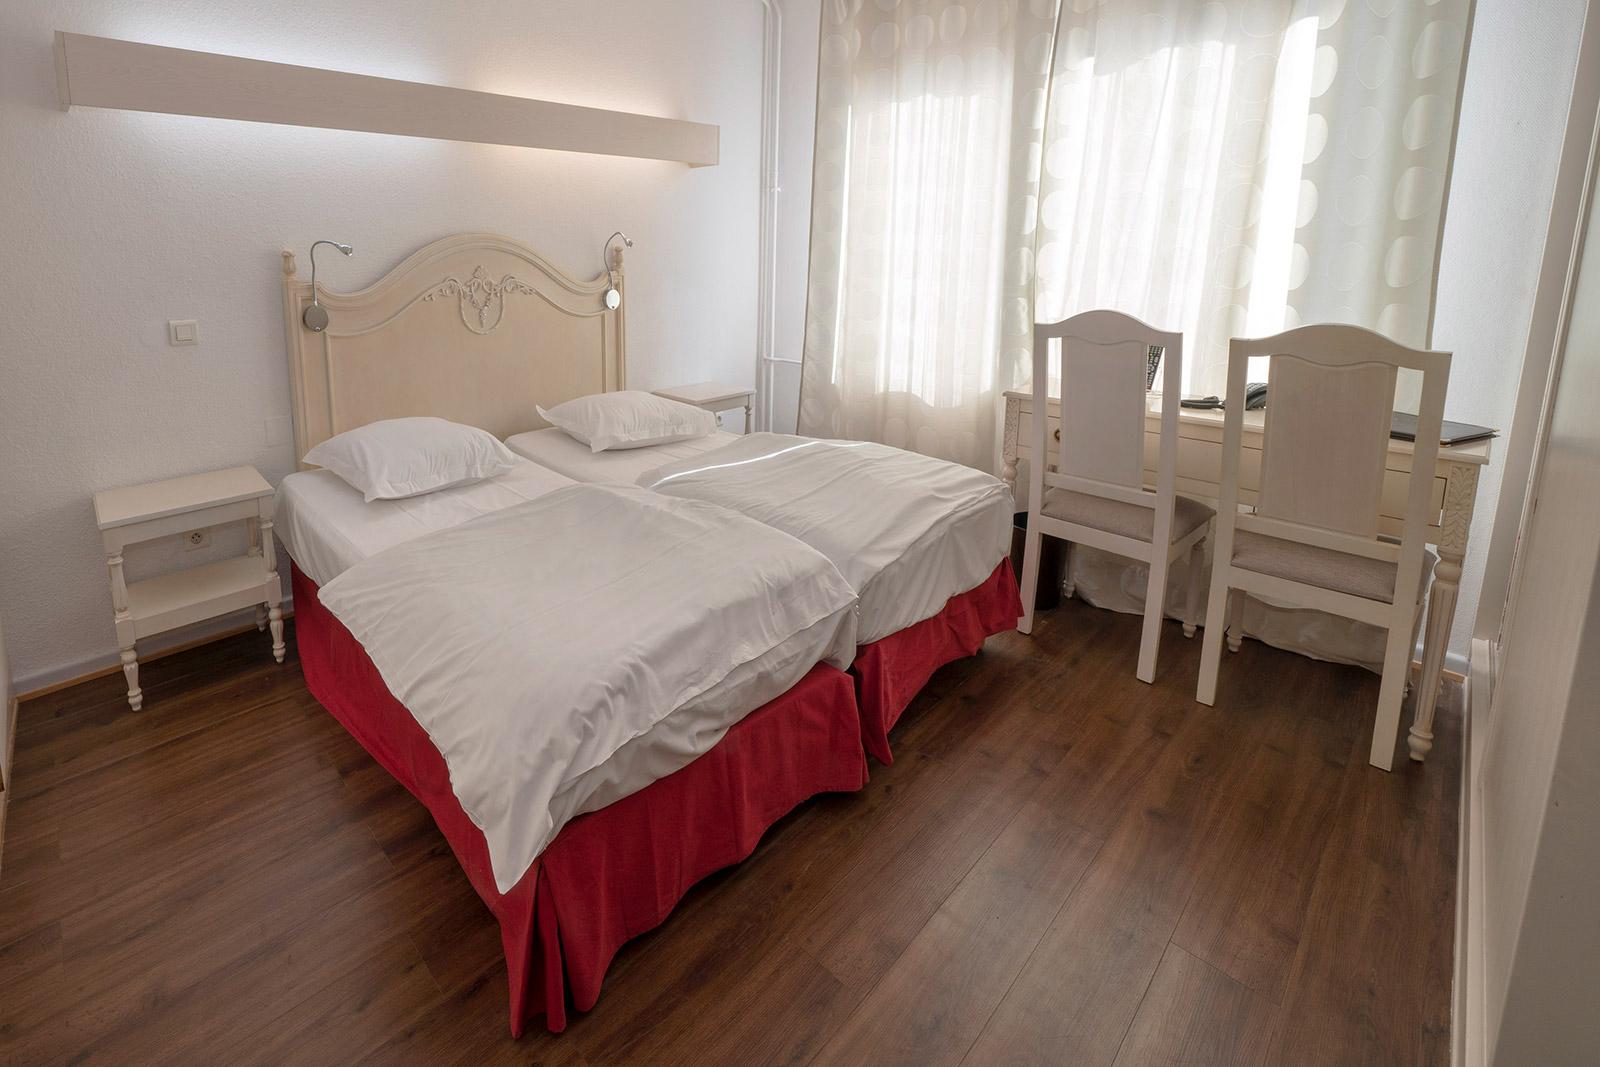 Hotel Majestic Alsace